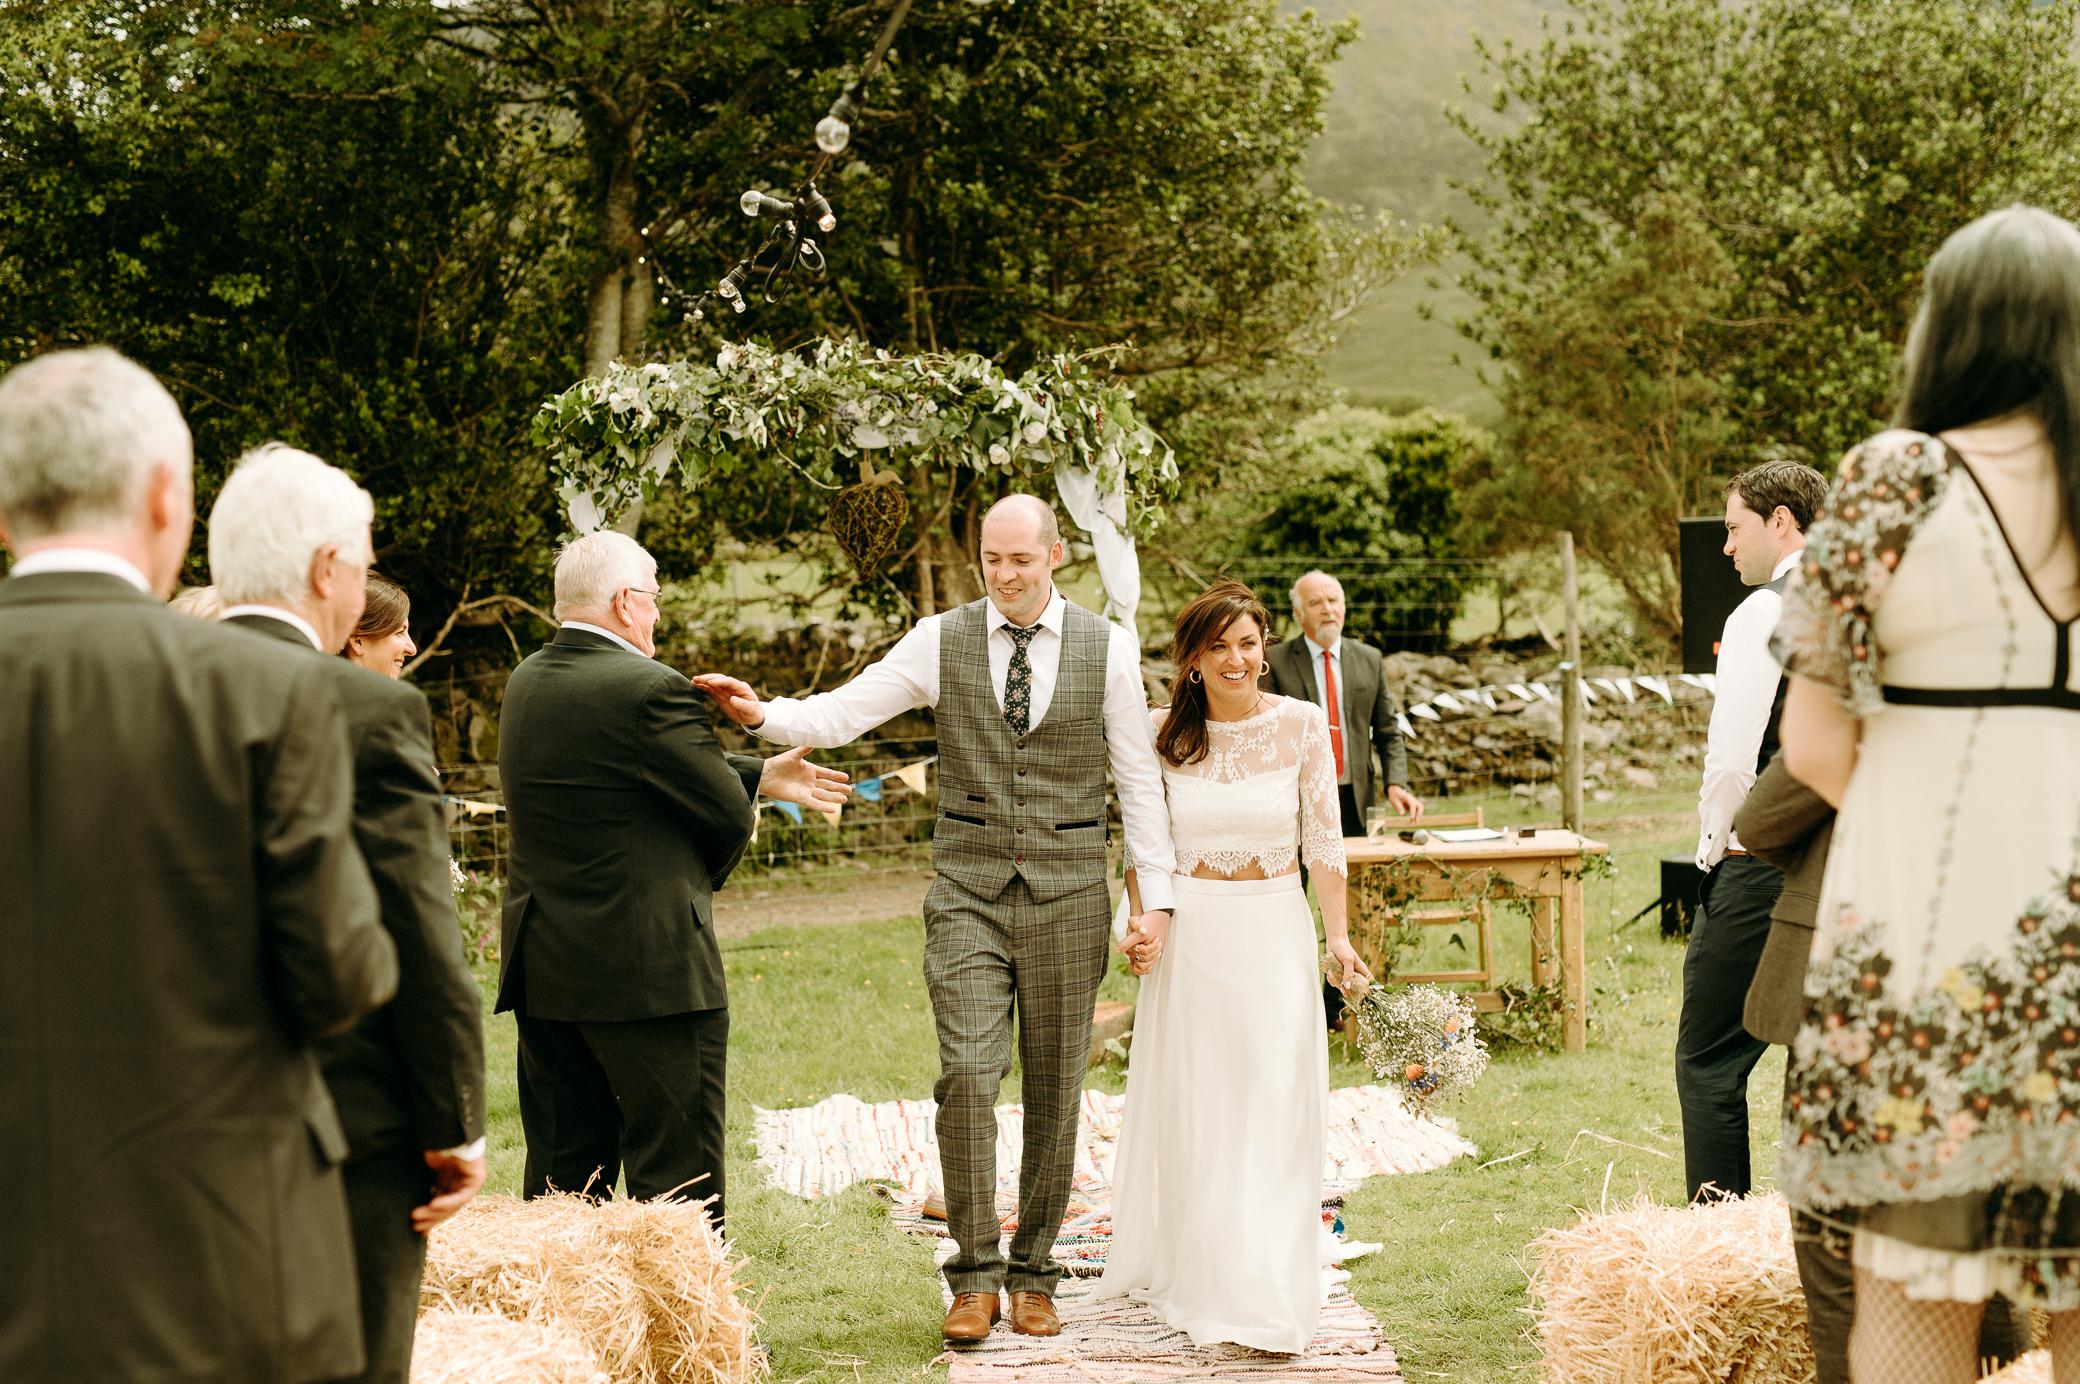 Carmel&Marcus_Wedding photographer Europe-61.jpg